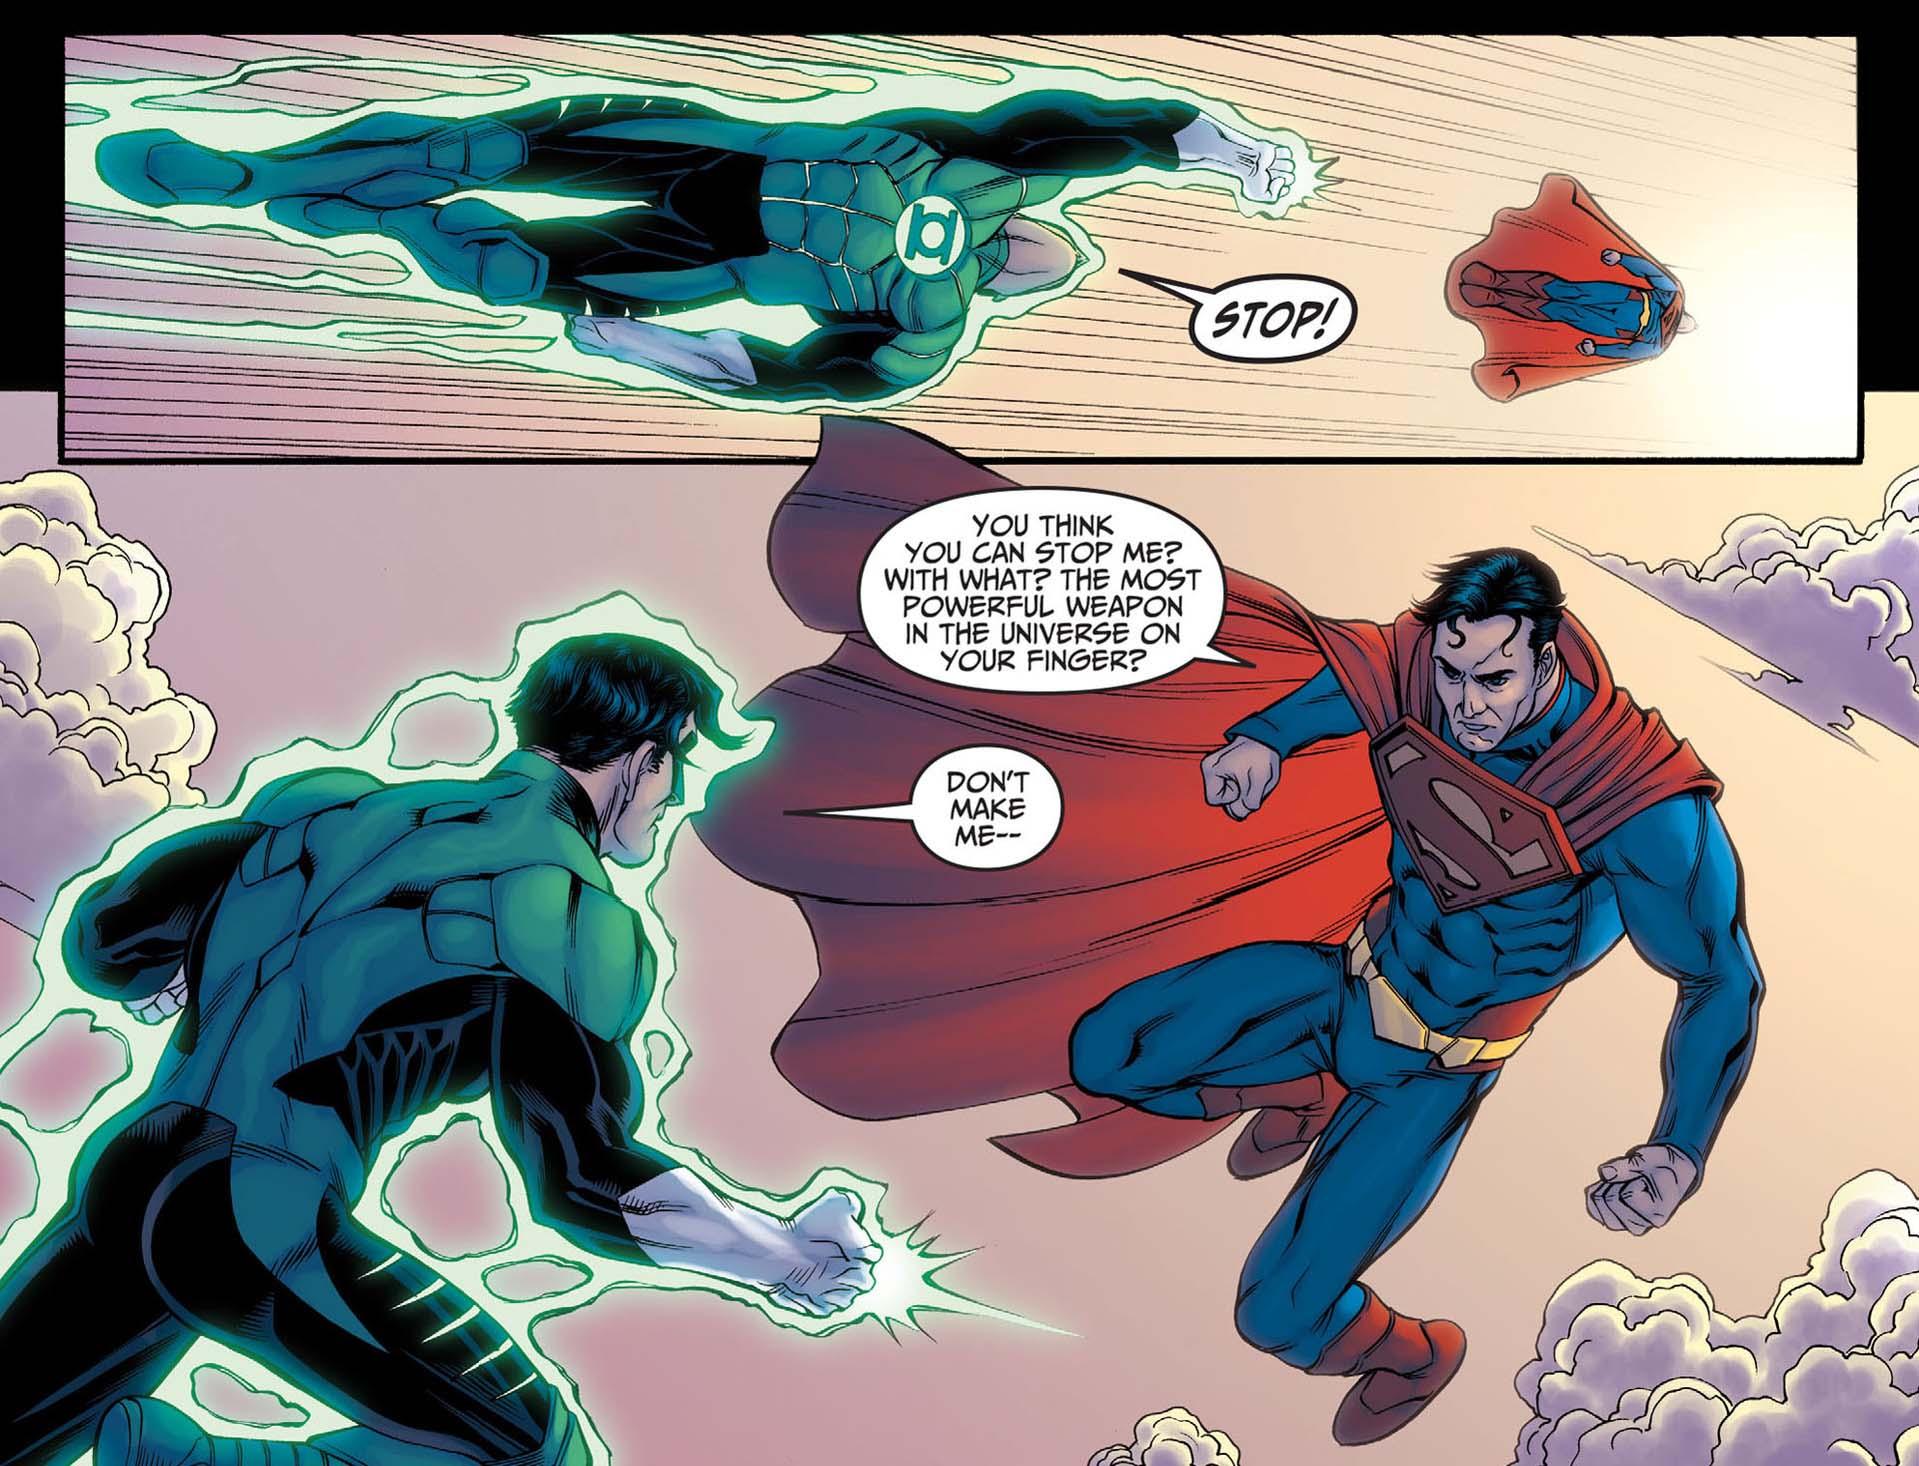 Superman vs green lantern - photo#27